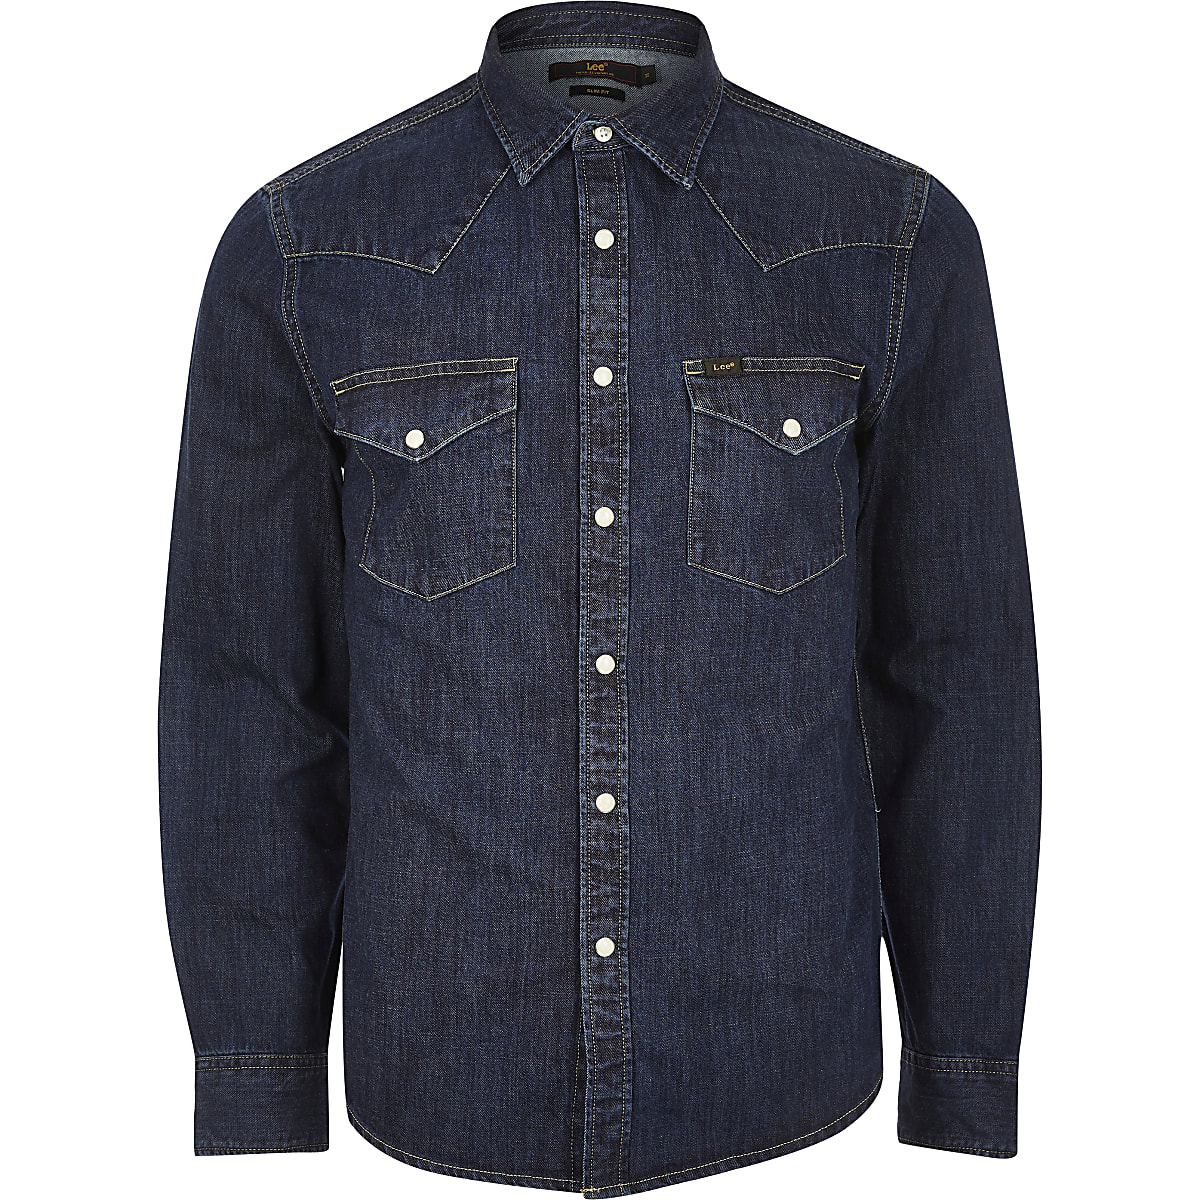 Lee Big and Tall dark blue western shirt